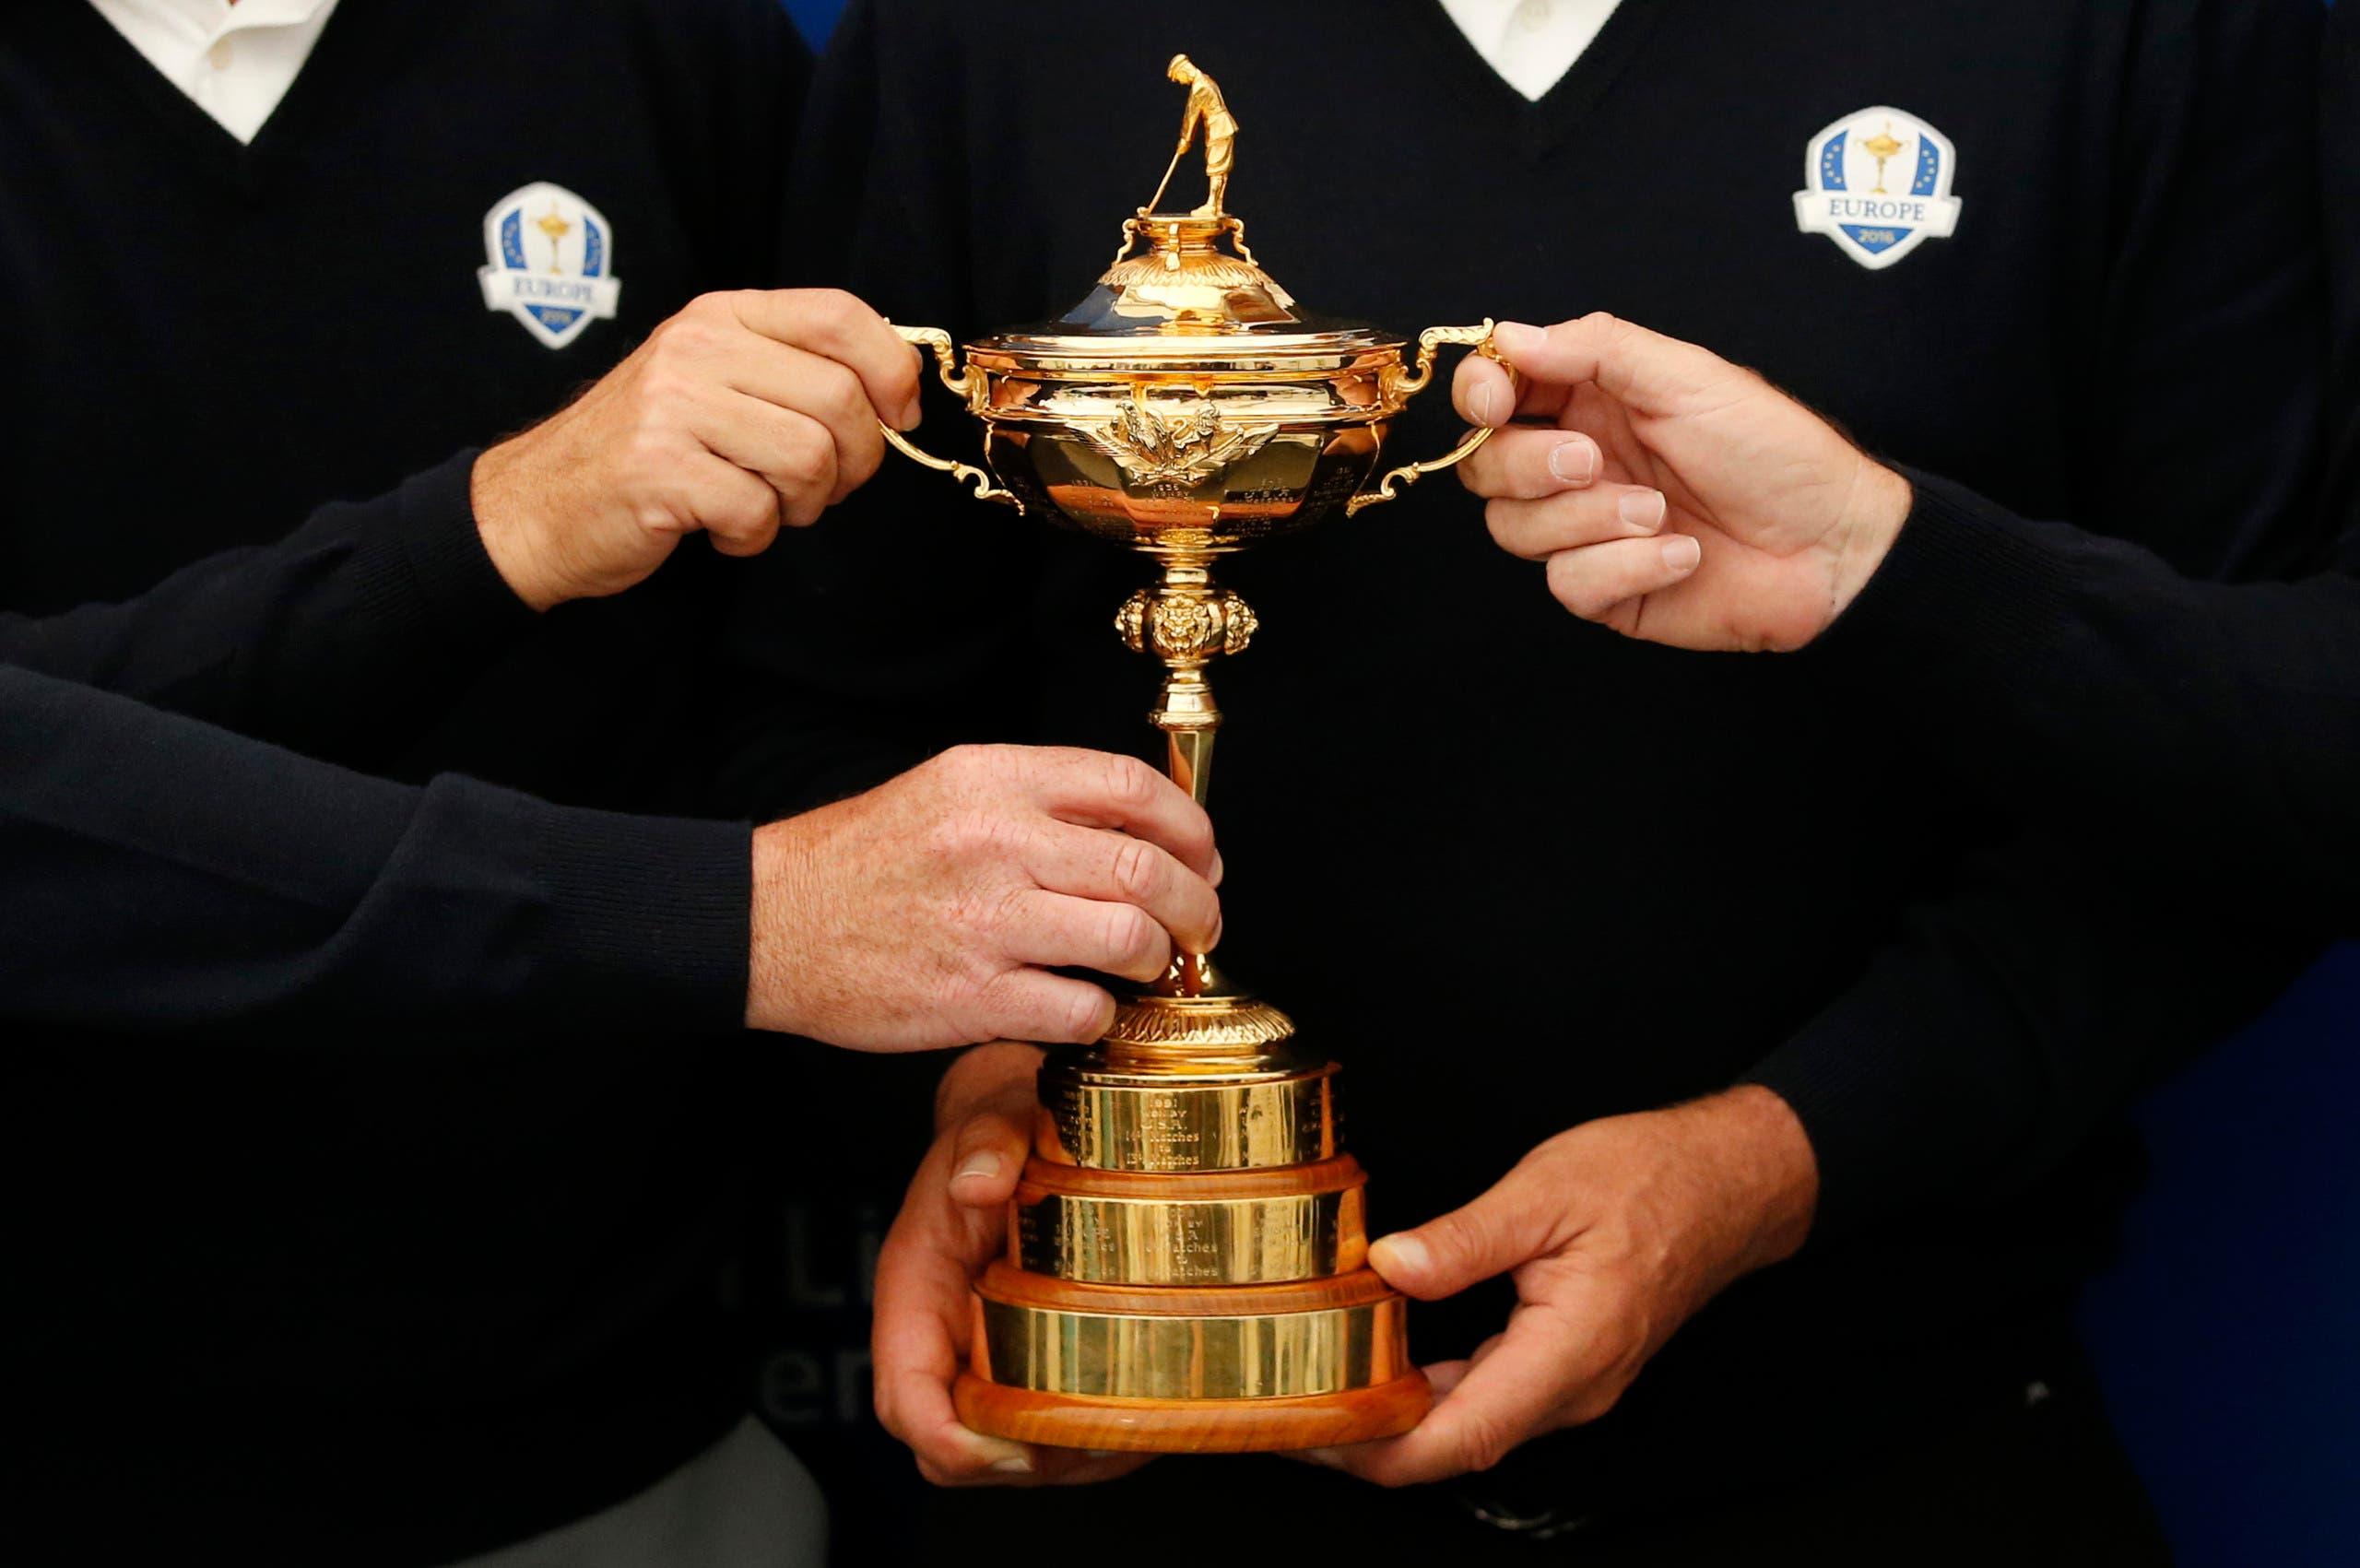 The United States Challenge Cup 21 Agnes Street E Providence RI 02914 Tel 401 6920859 Dave Adamonis Jr dadamoniscomcastnet